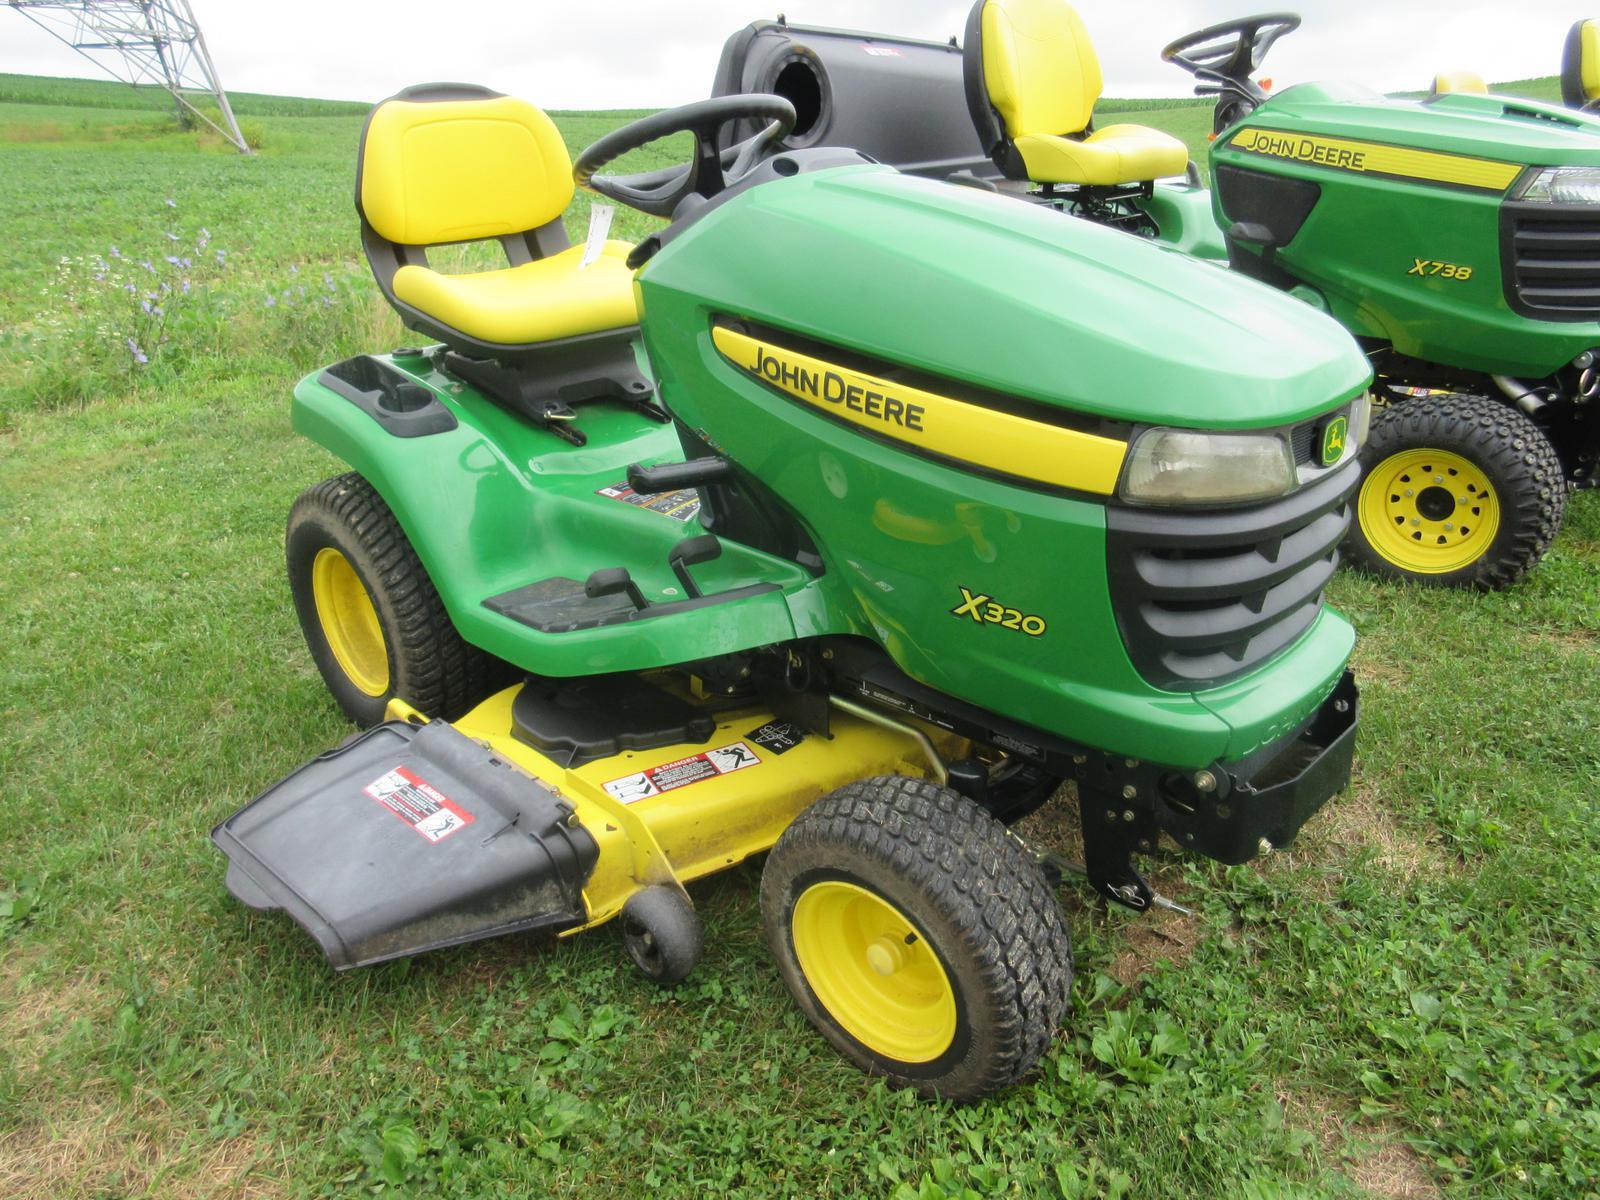 2007 John Deere X320 Tractor for sale in Bangor, PA  Hilltop Sales